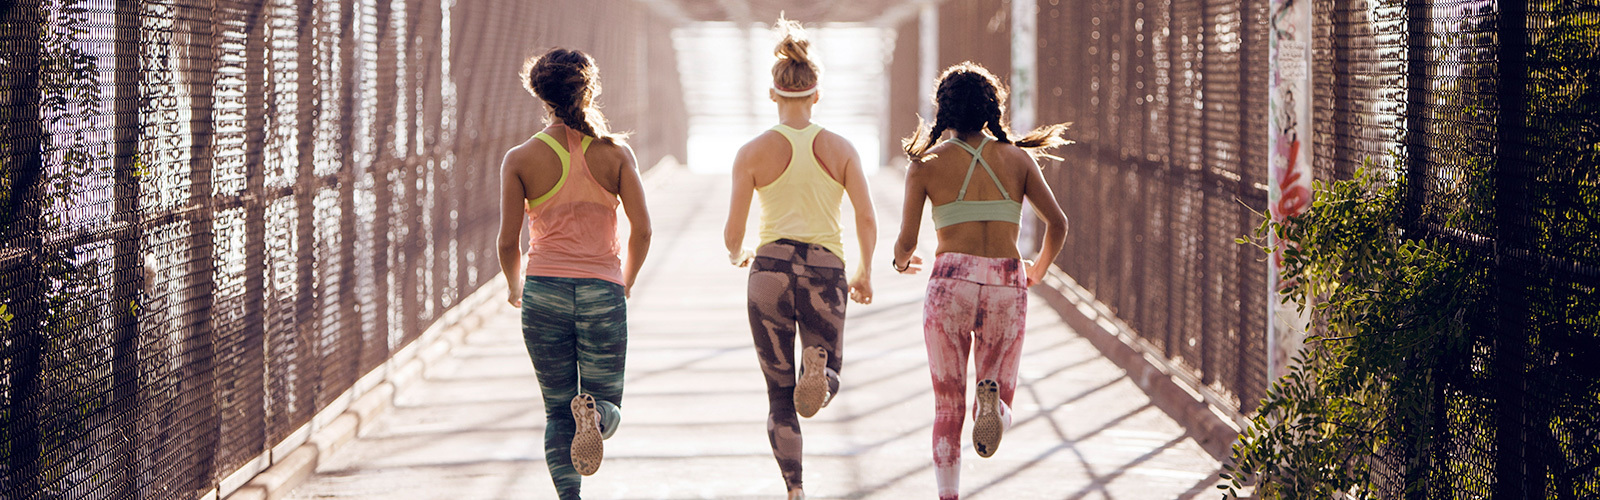 Three women running, seen from behind.